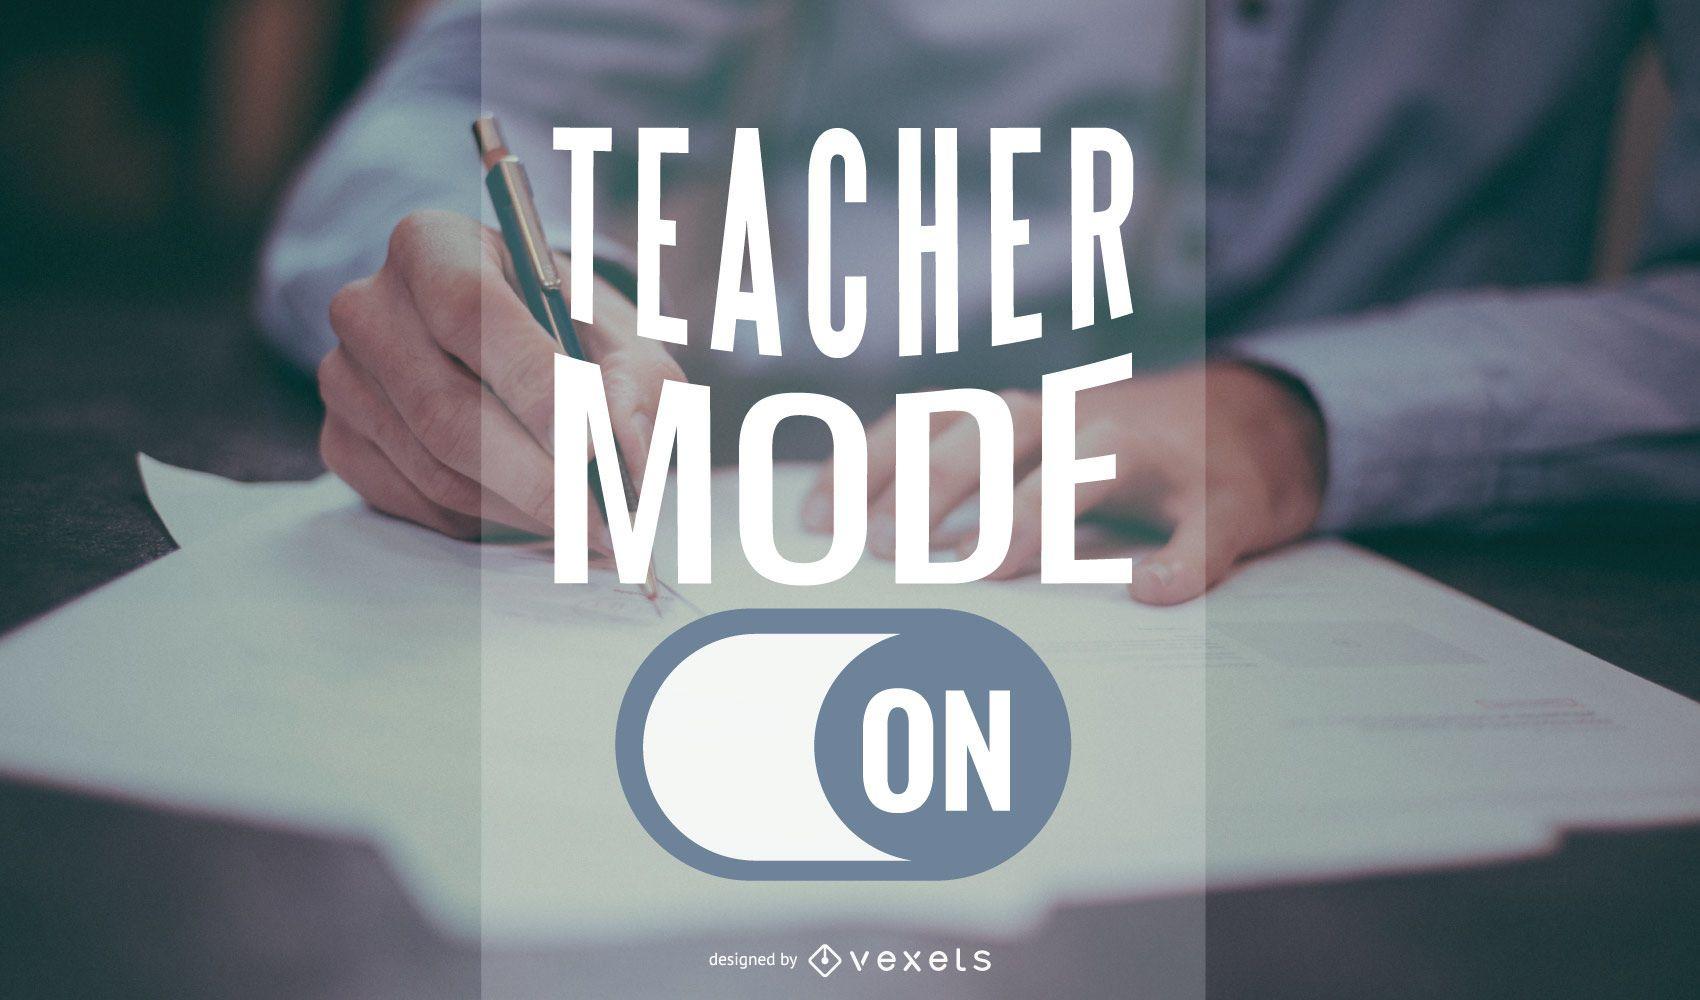 Design de banner vetorial de modo de professor